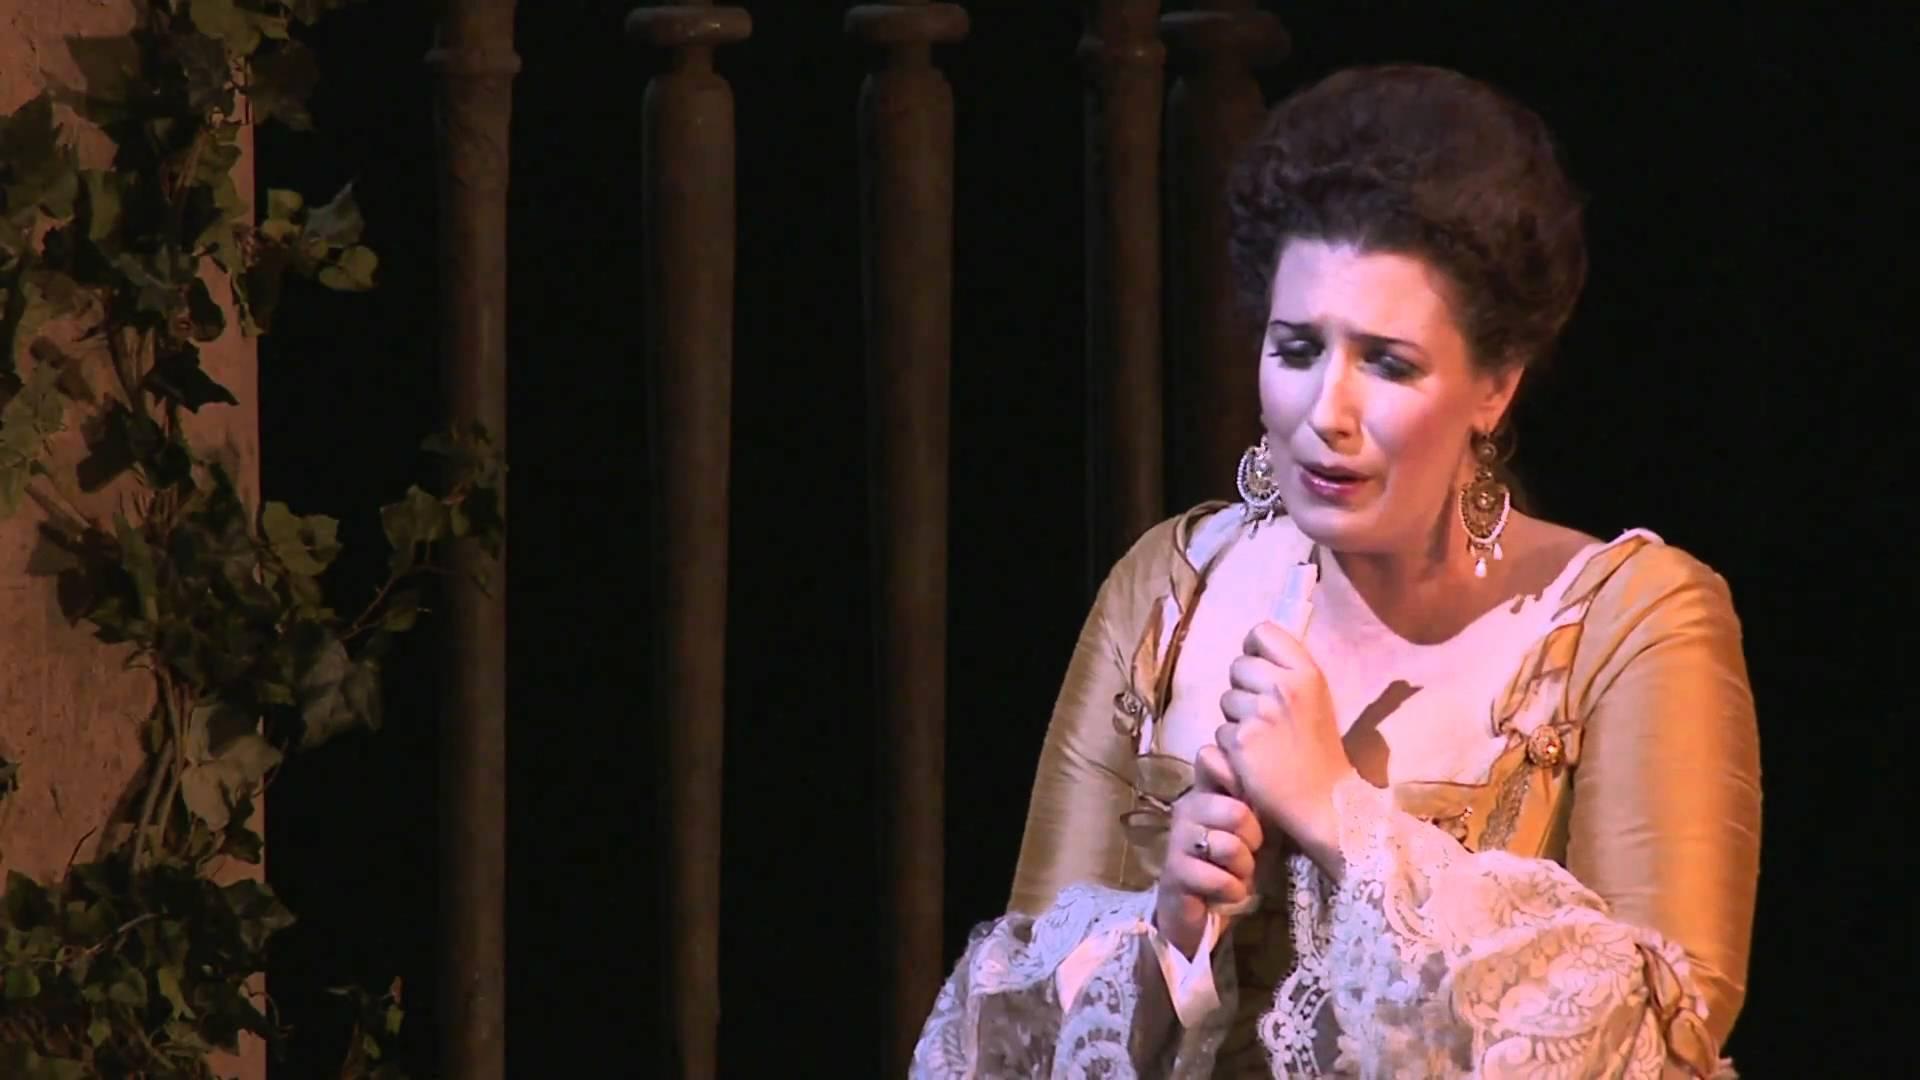 Marriage of Figaro, SF Opera